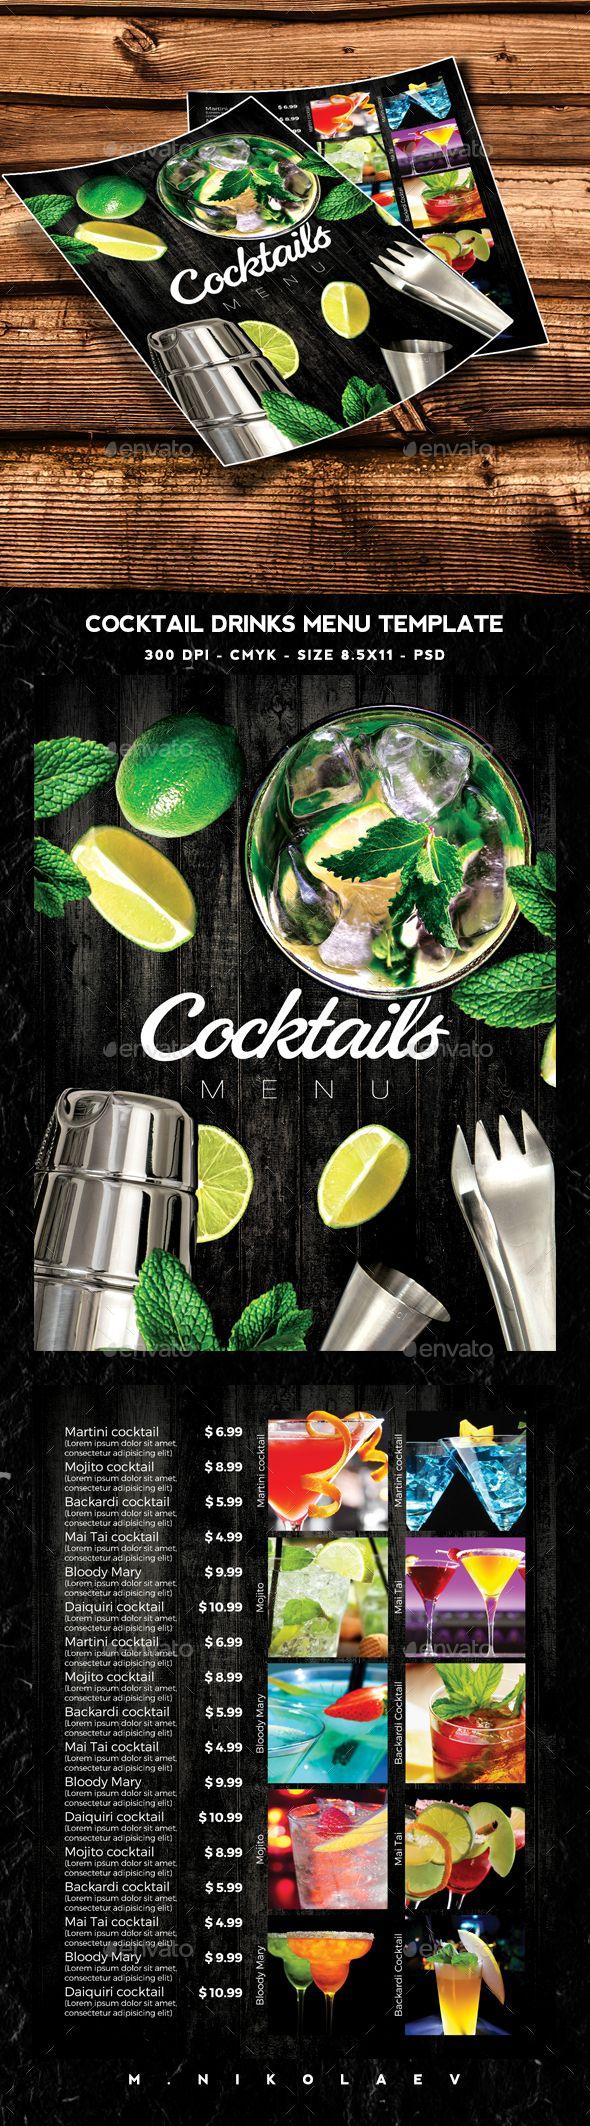 Cocktails Drinks Menu Template PSD. Download here: http://graphicriver.net/item/cocktails-drinks-menu/15275840?ref=ksioks